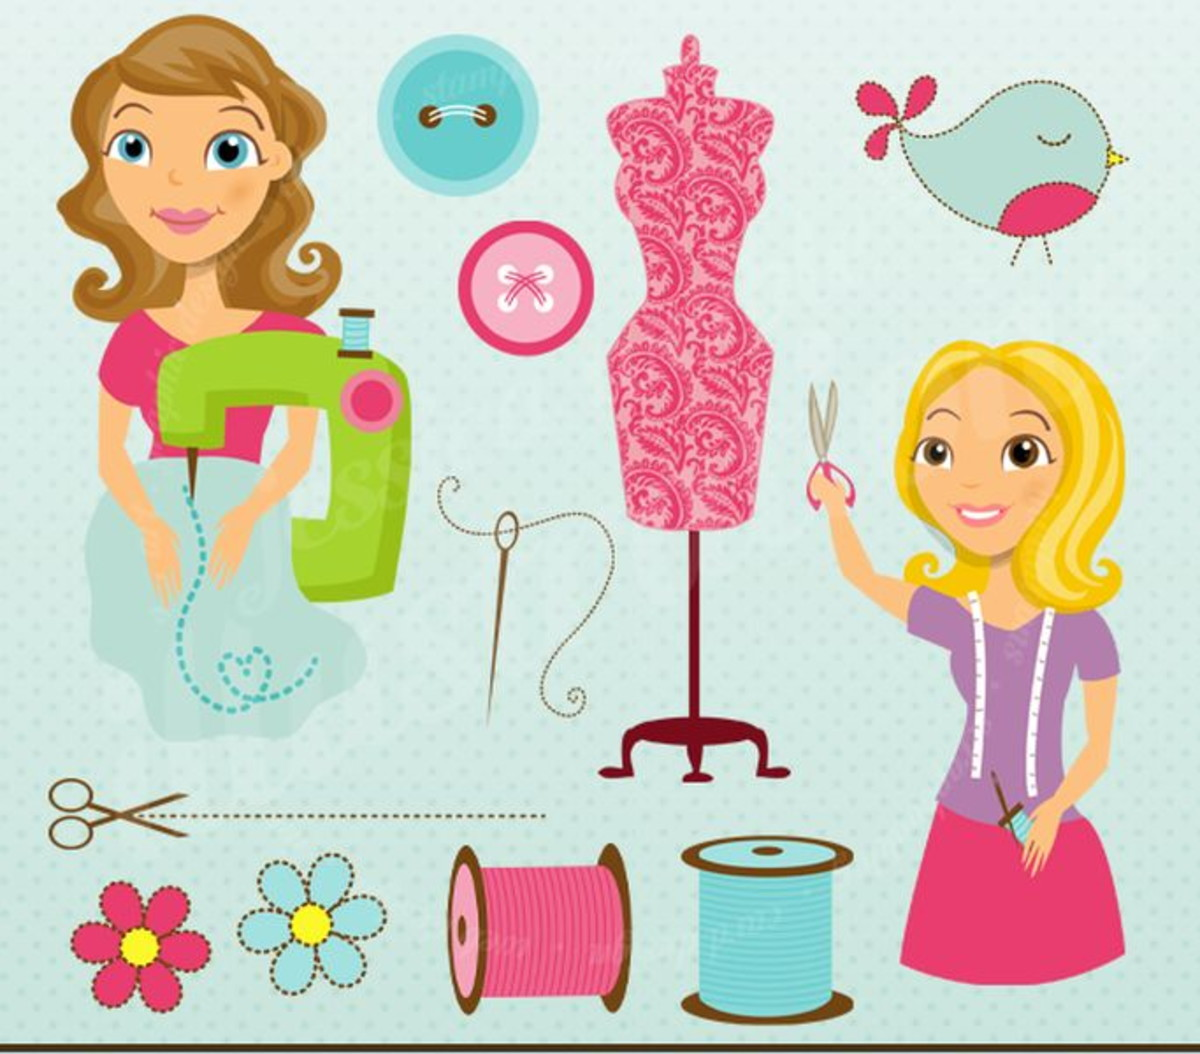 Costura clipart clip art freeuse download Kit Digital Meninas Atelier Costura Costureira Clipart JW158 clip art freeuse download